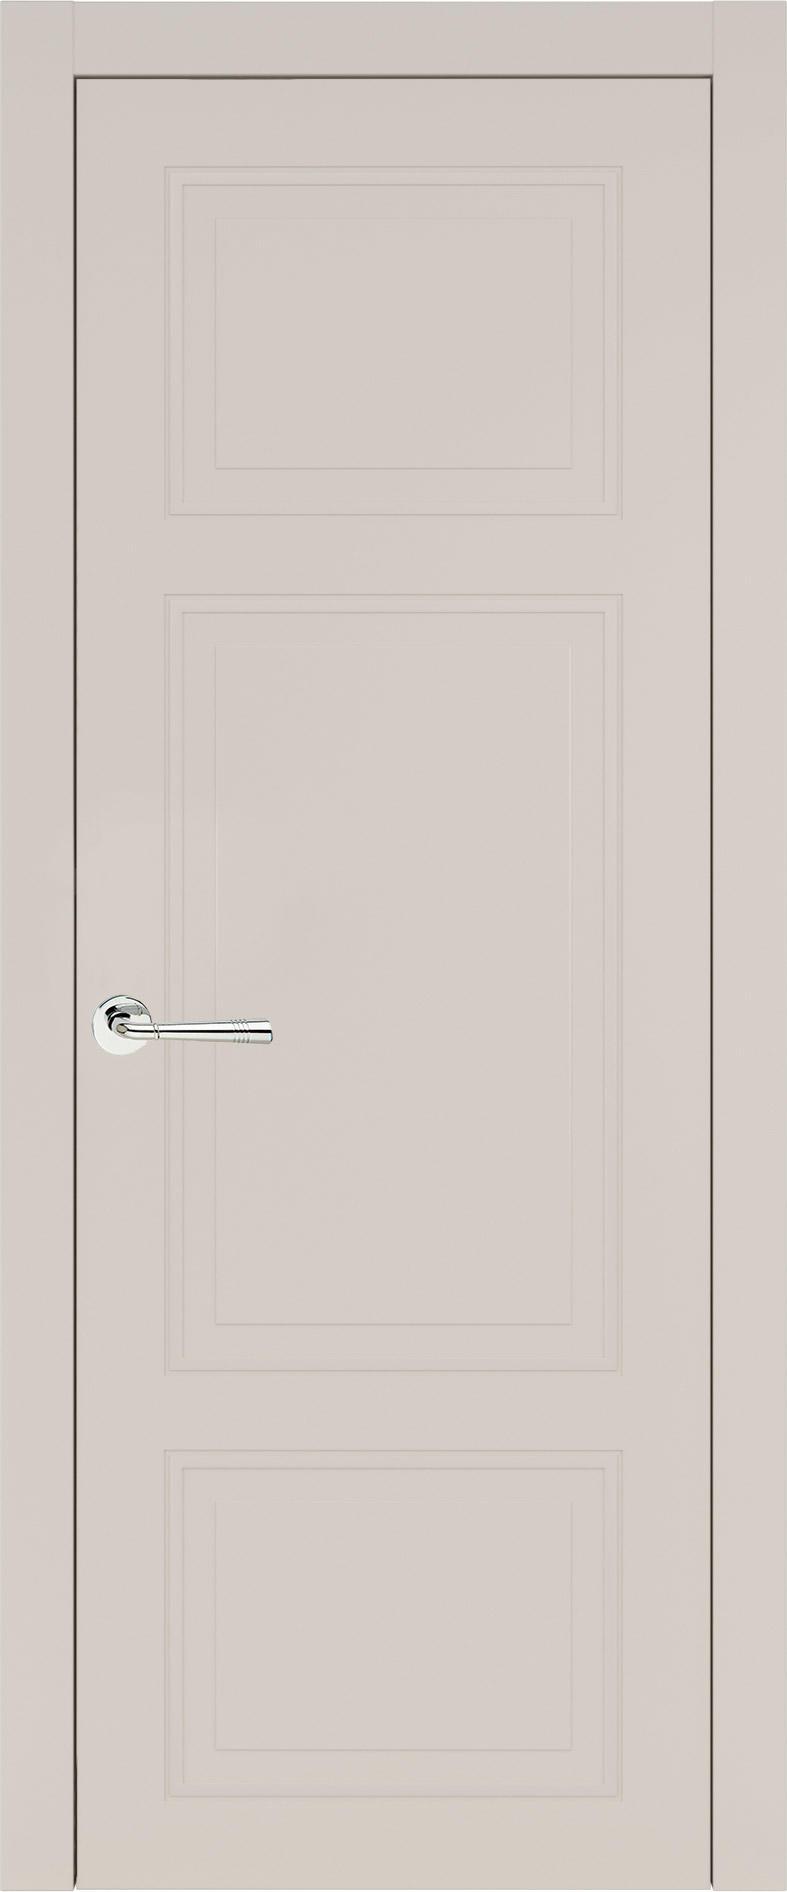 Siena Neo Classic цвет - Жемчужная эмаль (RAL 1013) Без стекла (ДГ)